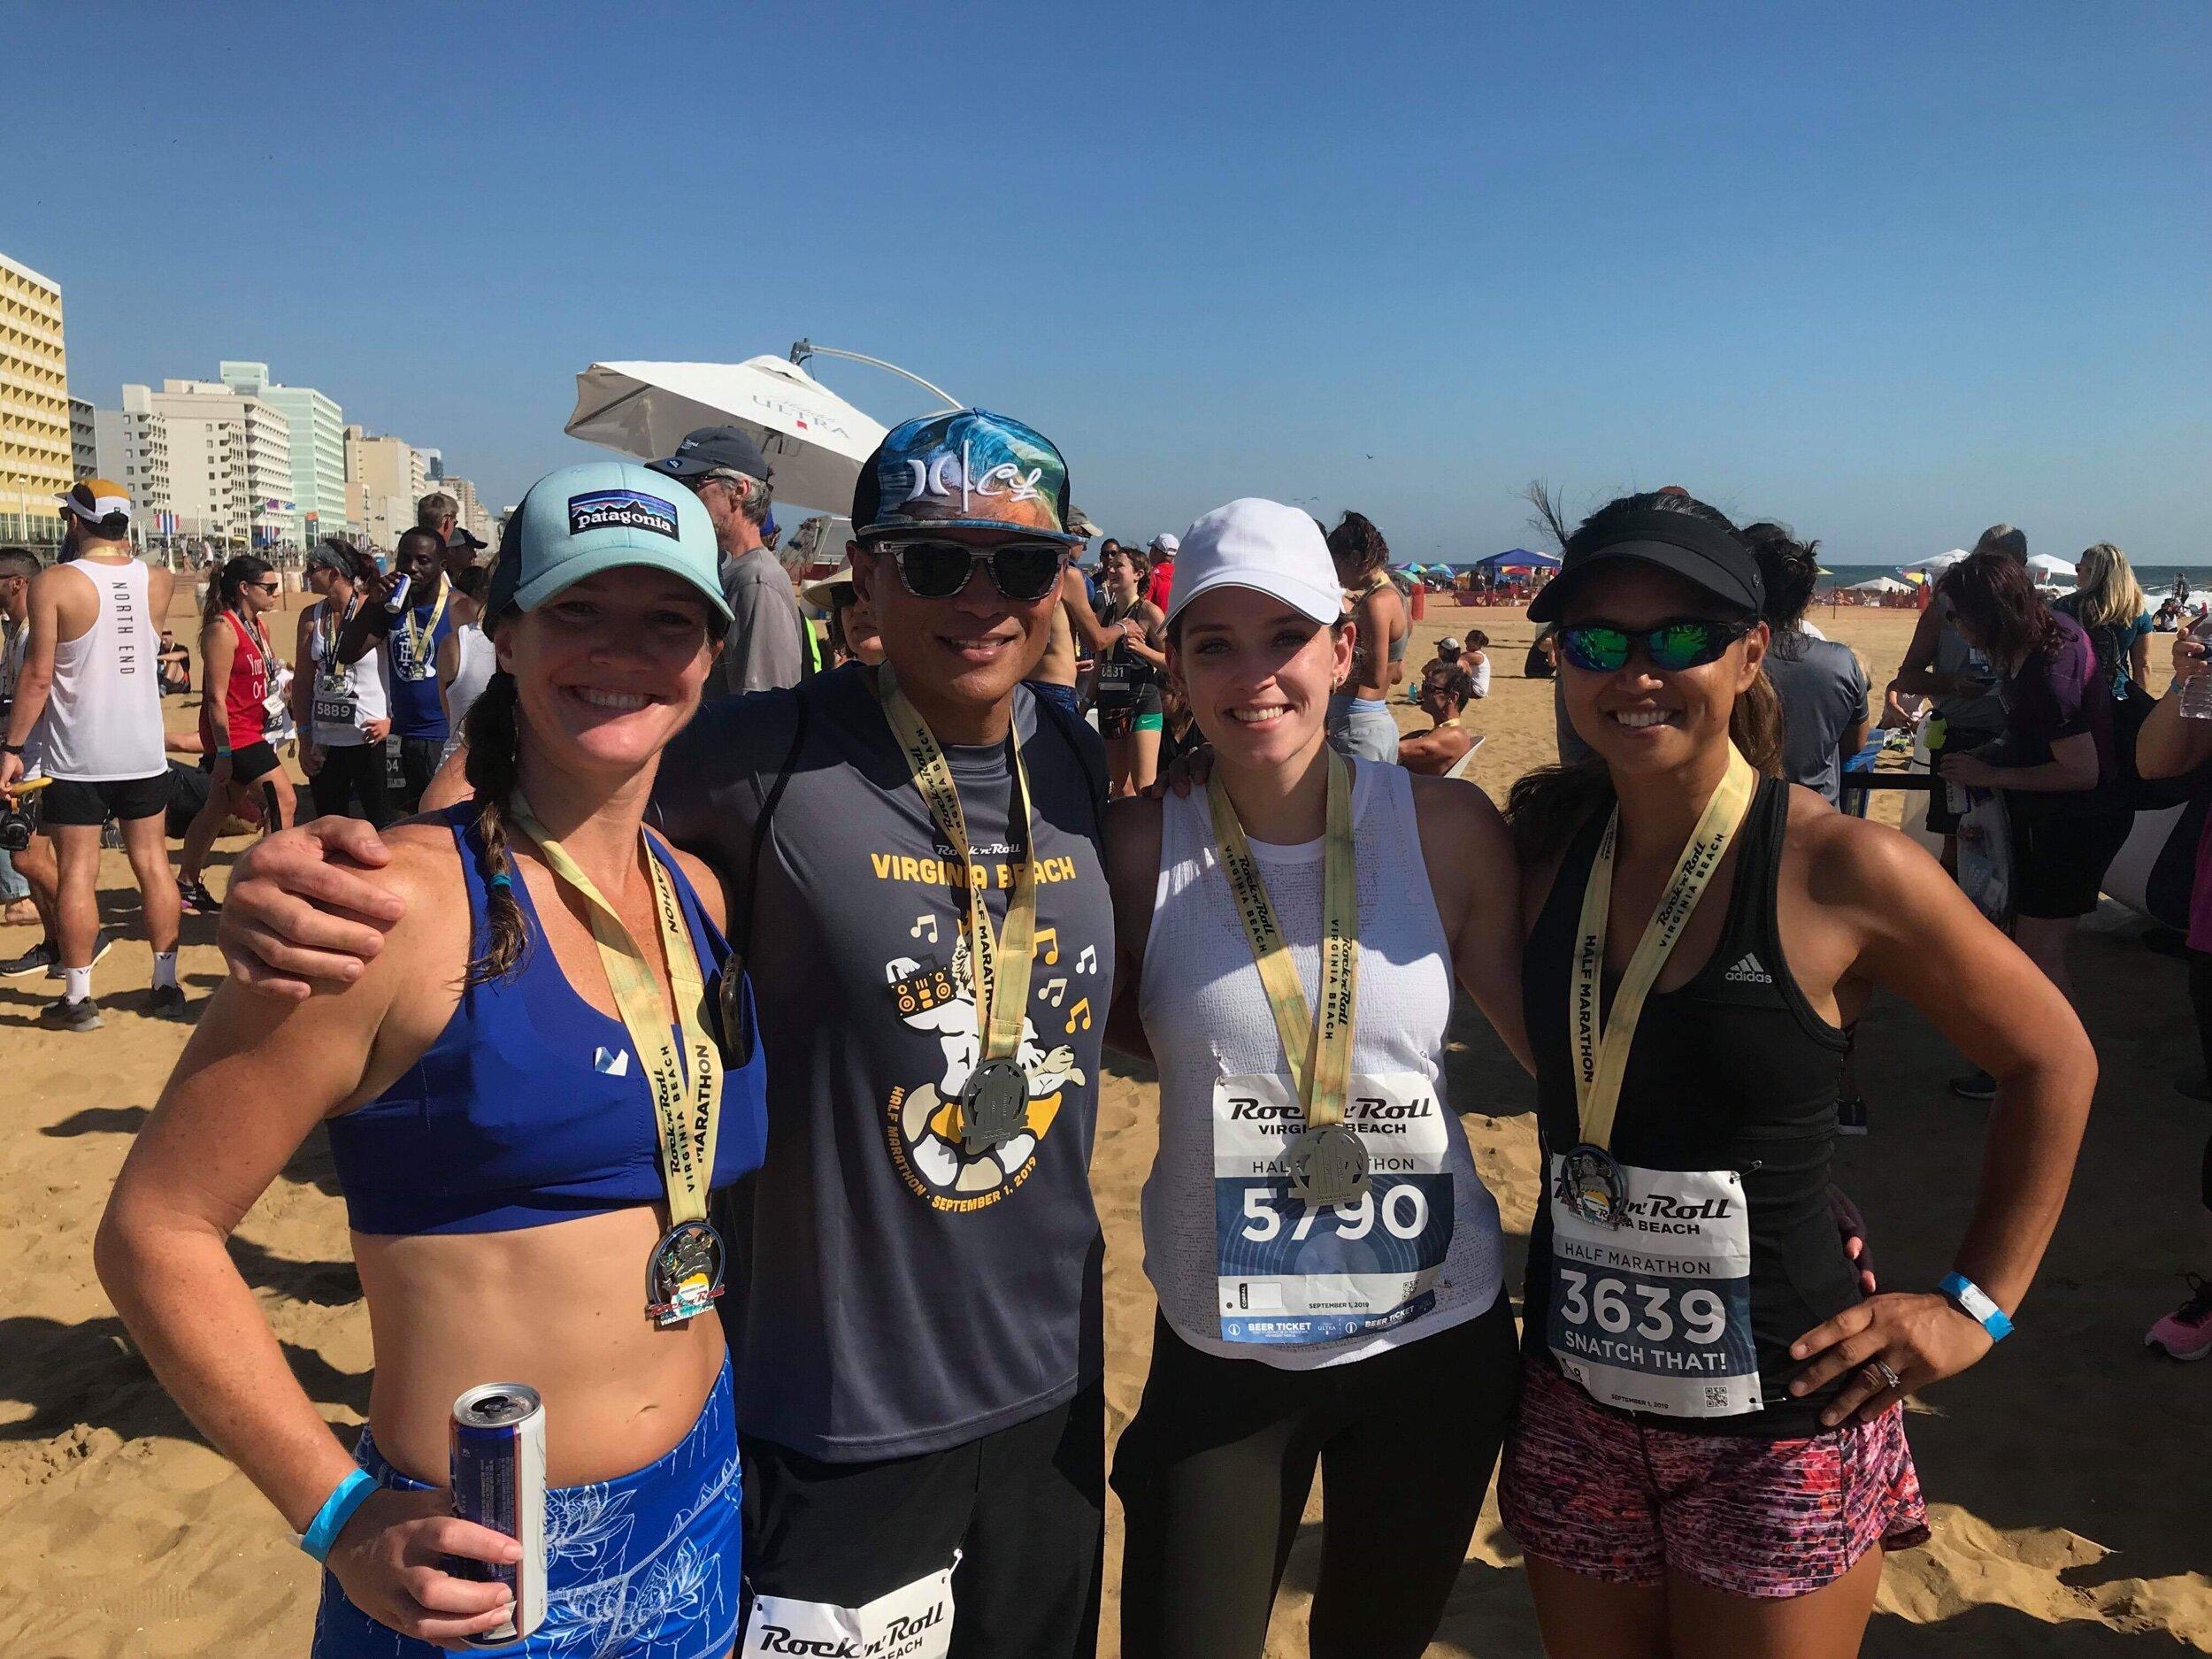 Rock and Roll Half Marathon! Shana's 1st 13.1 mi race! Sept 2019 w/ Stephanie, Gil, & Julie